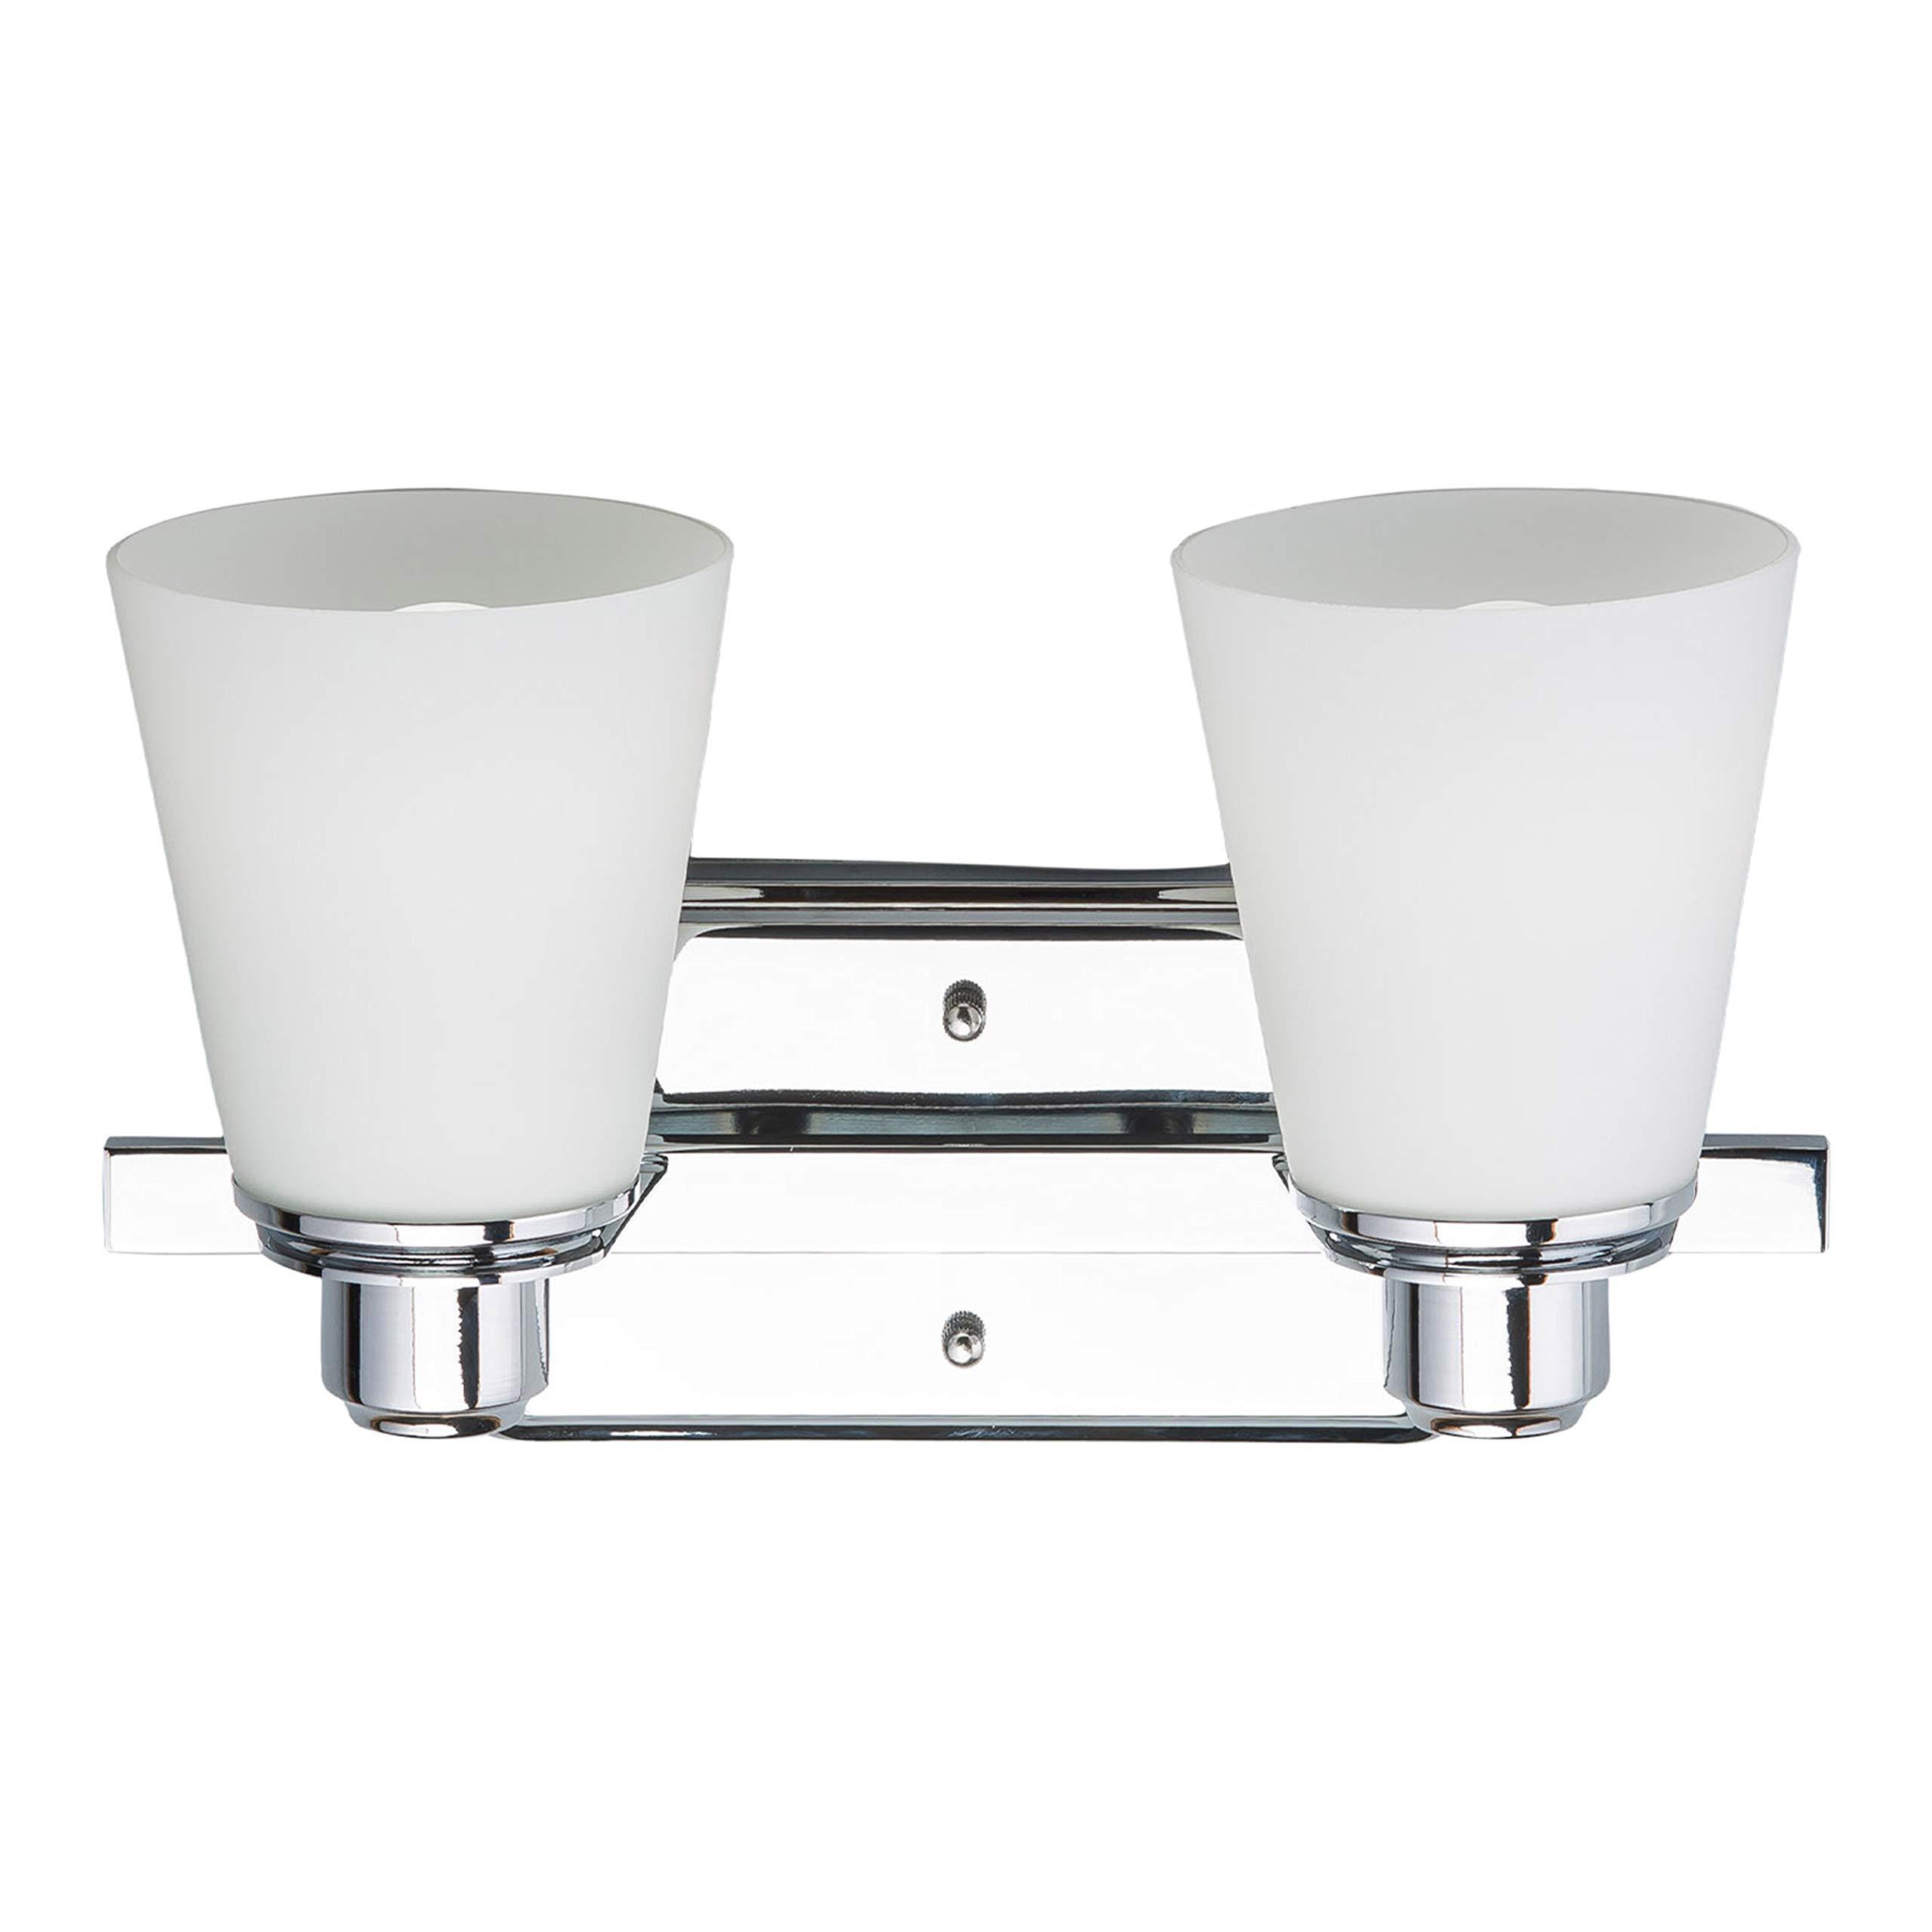 Terracina Two-Light Vanity Sconce Lamp, Polished Chrome with Opal Glass Linea di Liara LL-WL220-2 by Linea di Liara (Image #5)